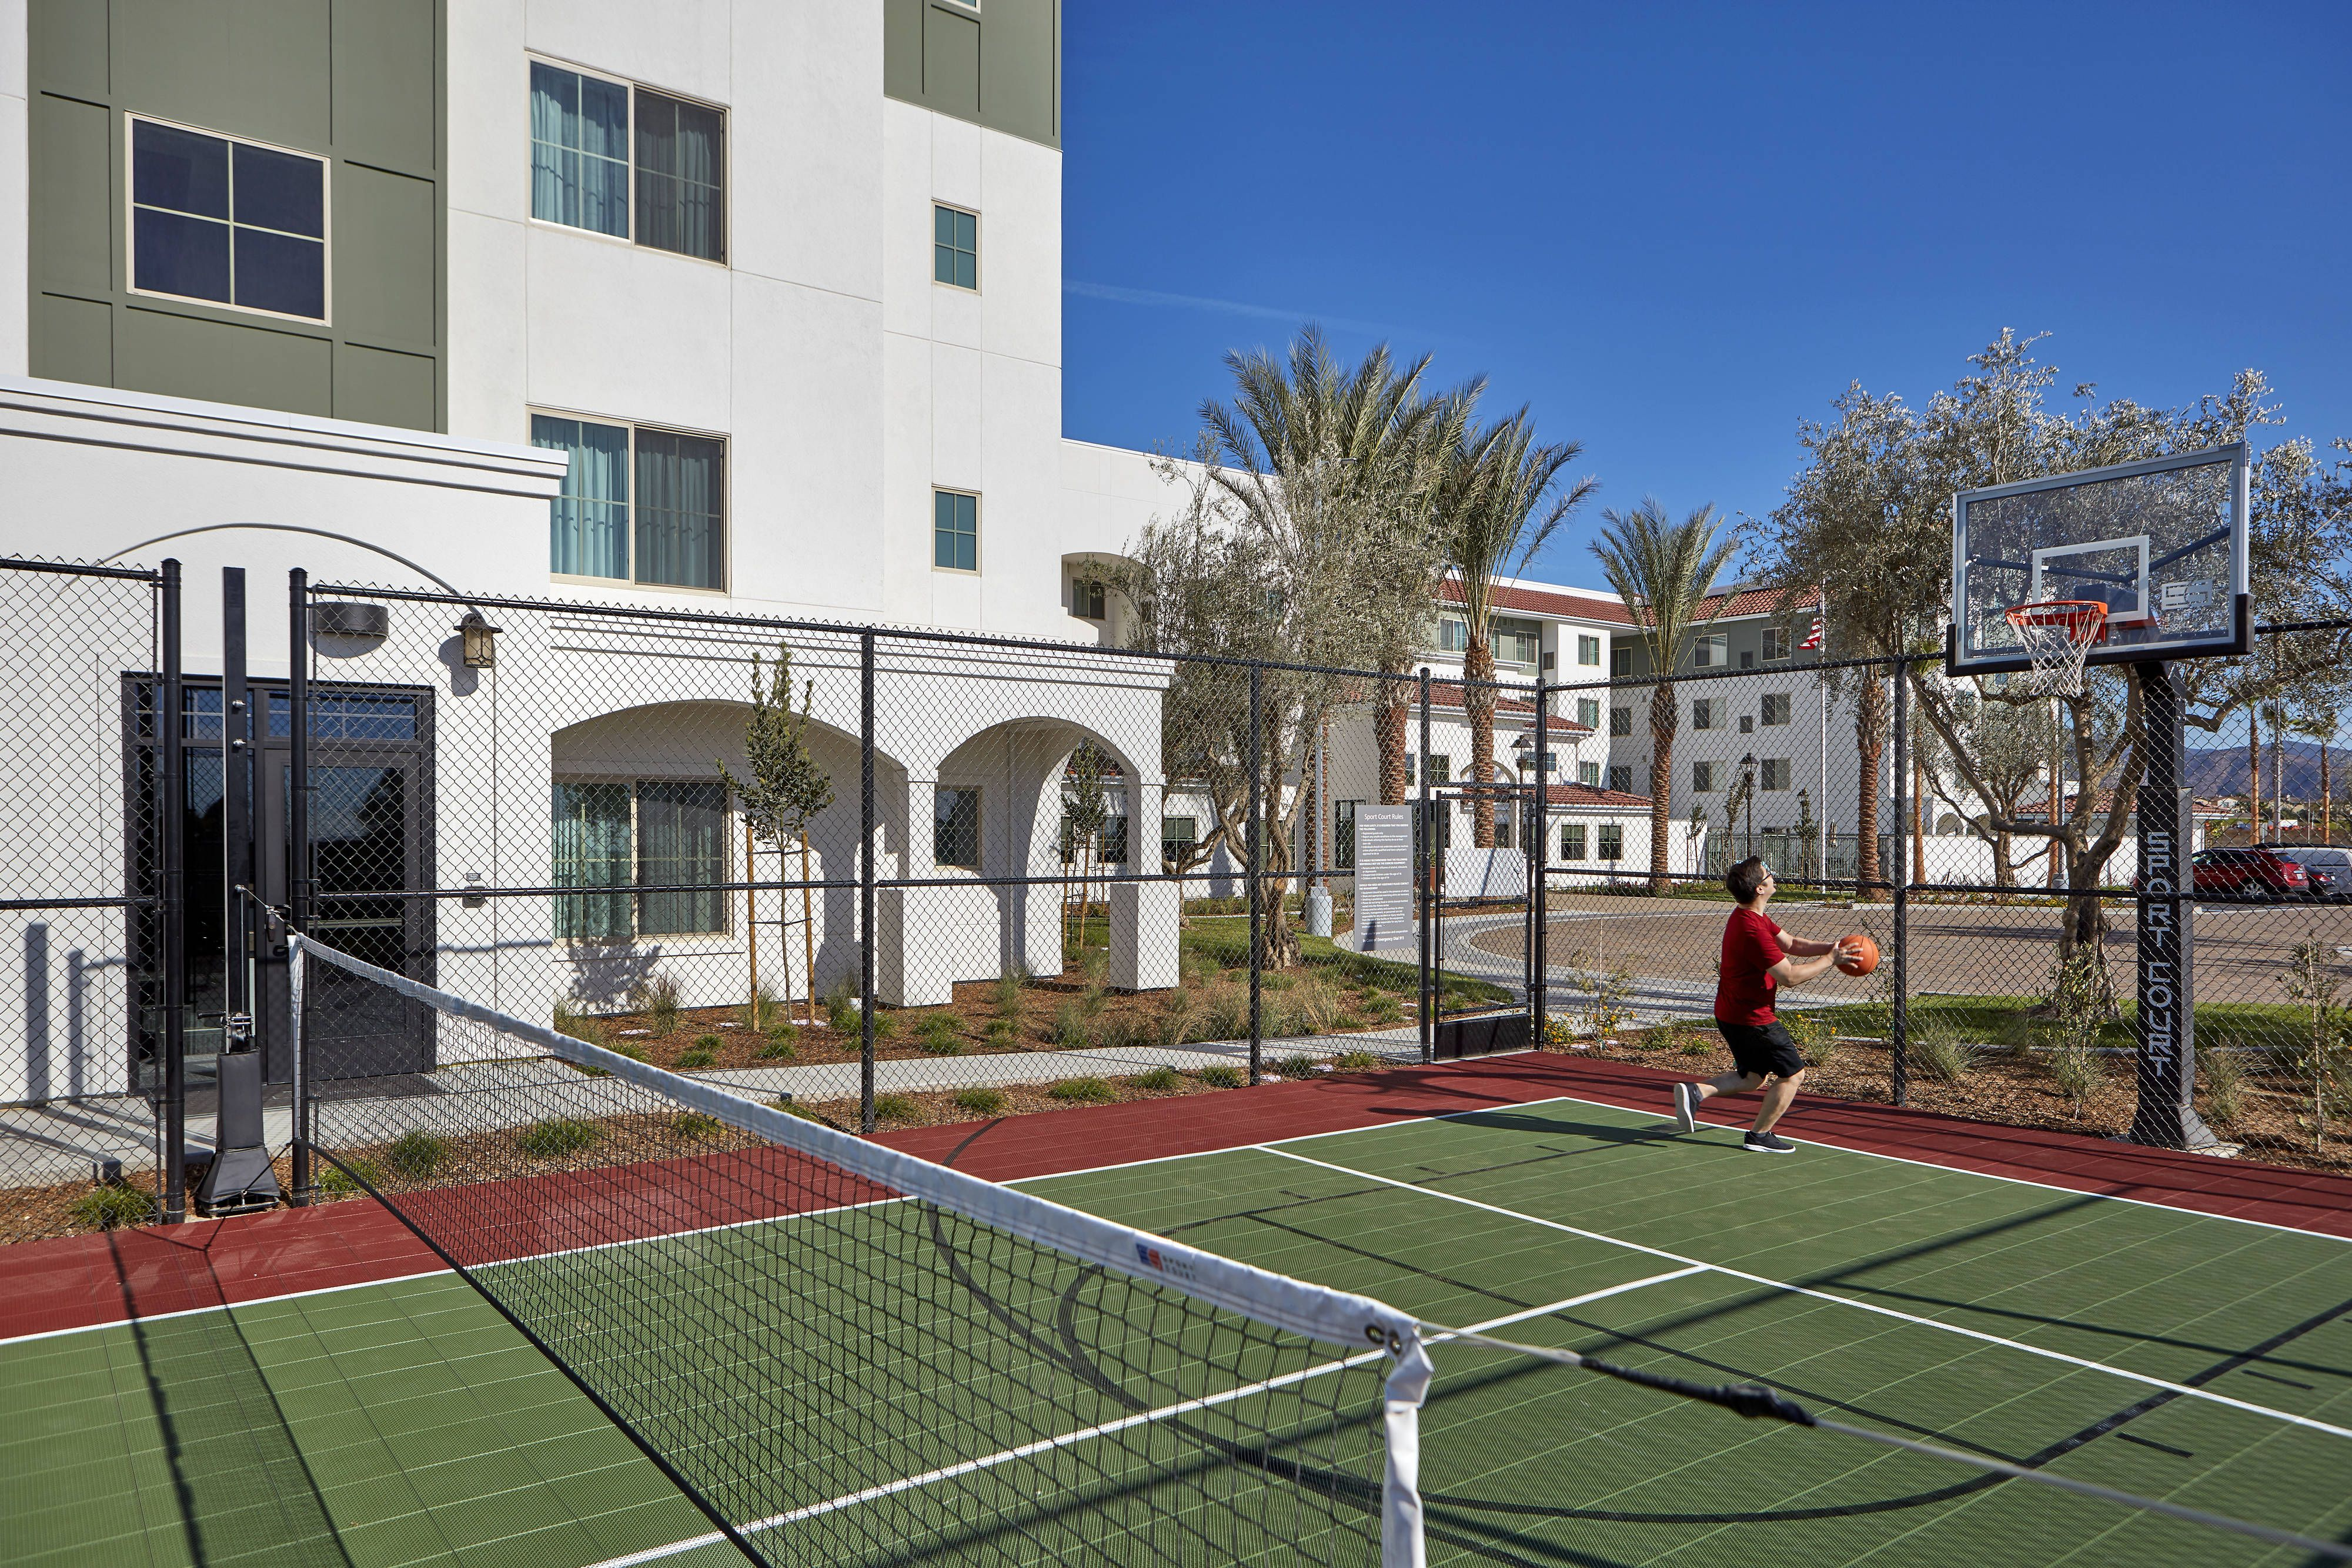 Residence Inn San Diego Chula Vista Sports Courts Memorable Comfort Guestbathroom Chula Vista Residences Inn